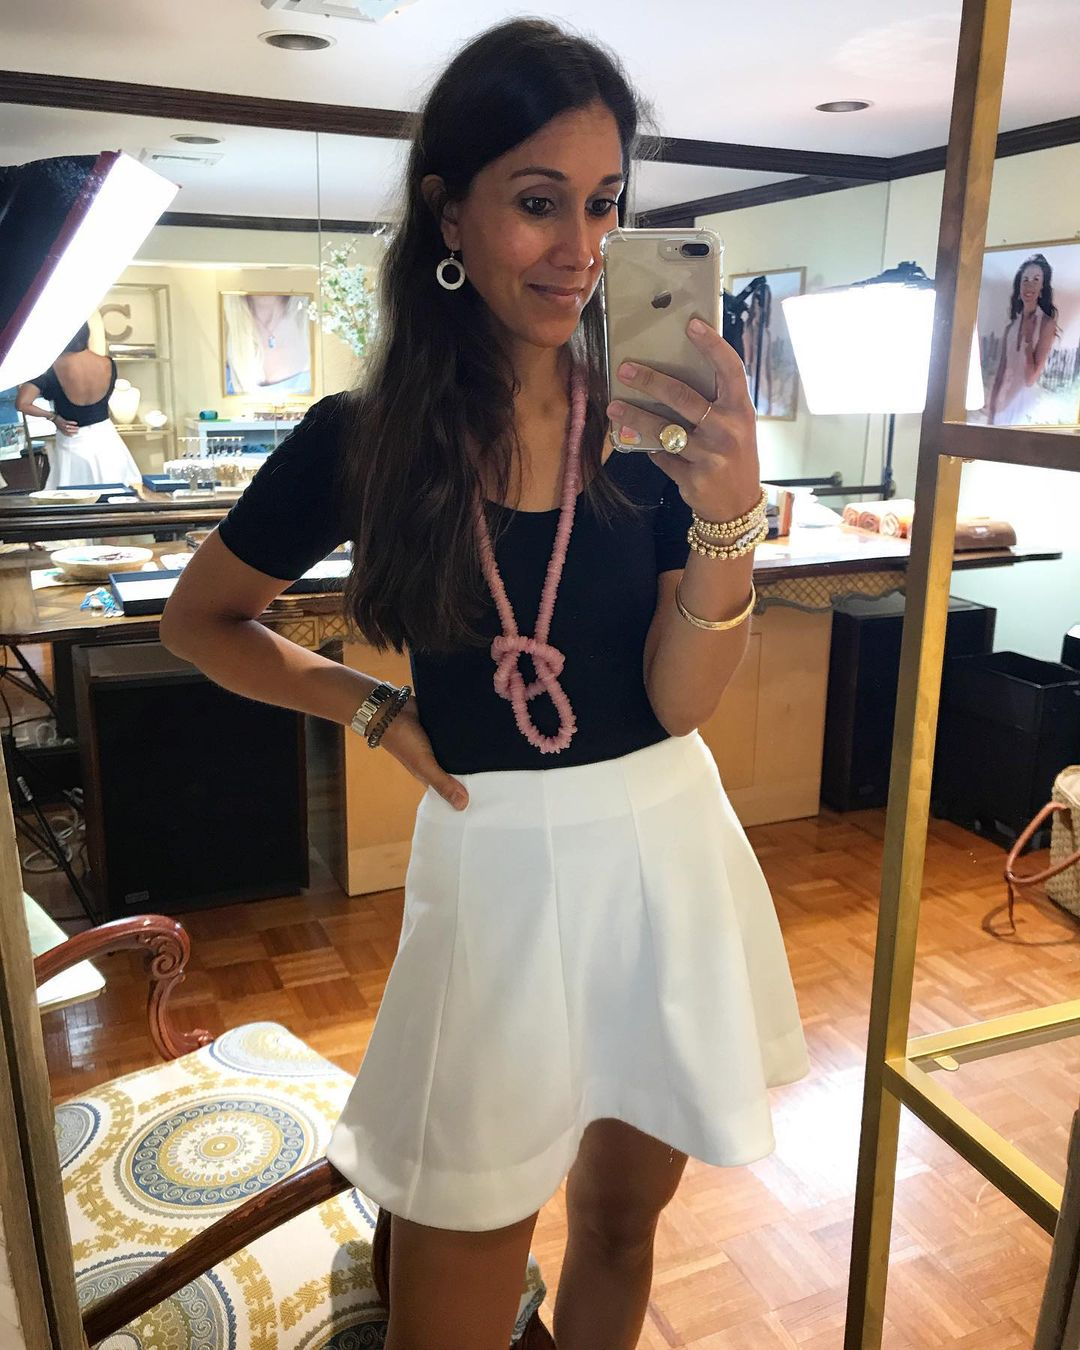 Cristina V with Phone